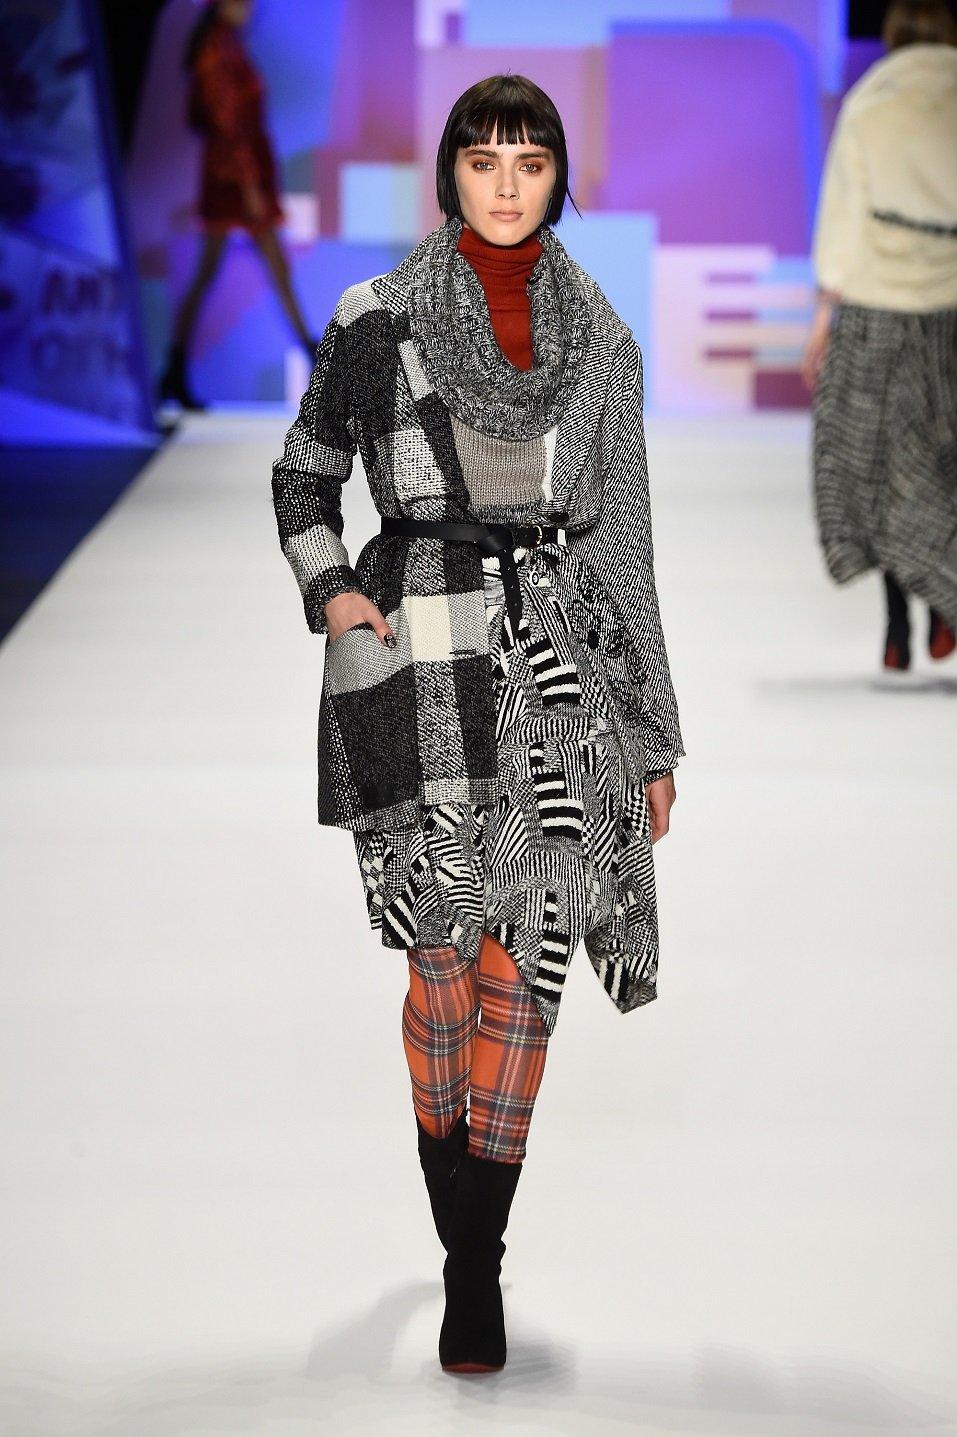 A model walks the runway wearing Desigual Fall 2016 during New York Fashion Week